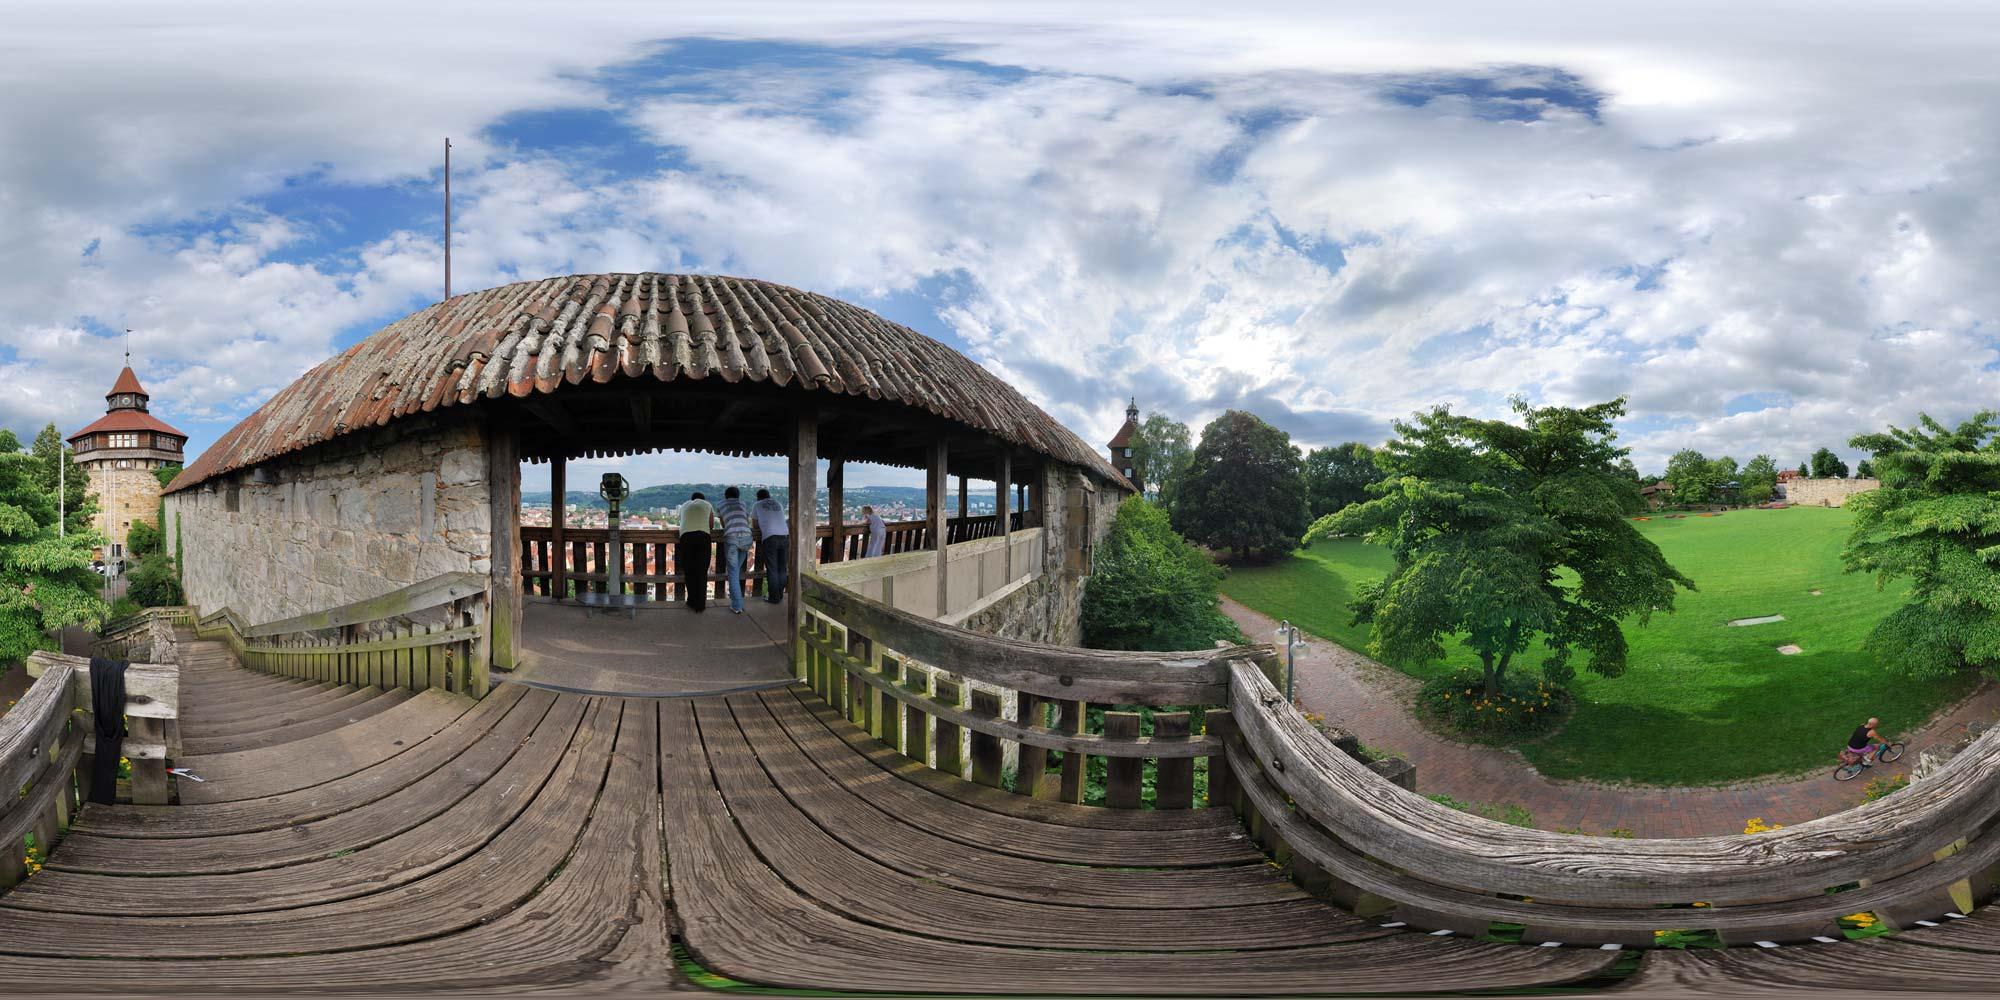 Kubische Panoramen Panorama Foto Esslingen Am Neckar Burg Burghof